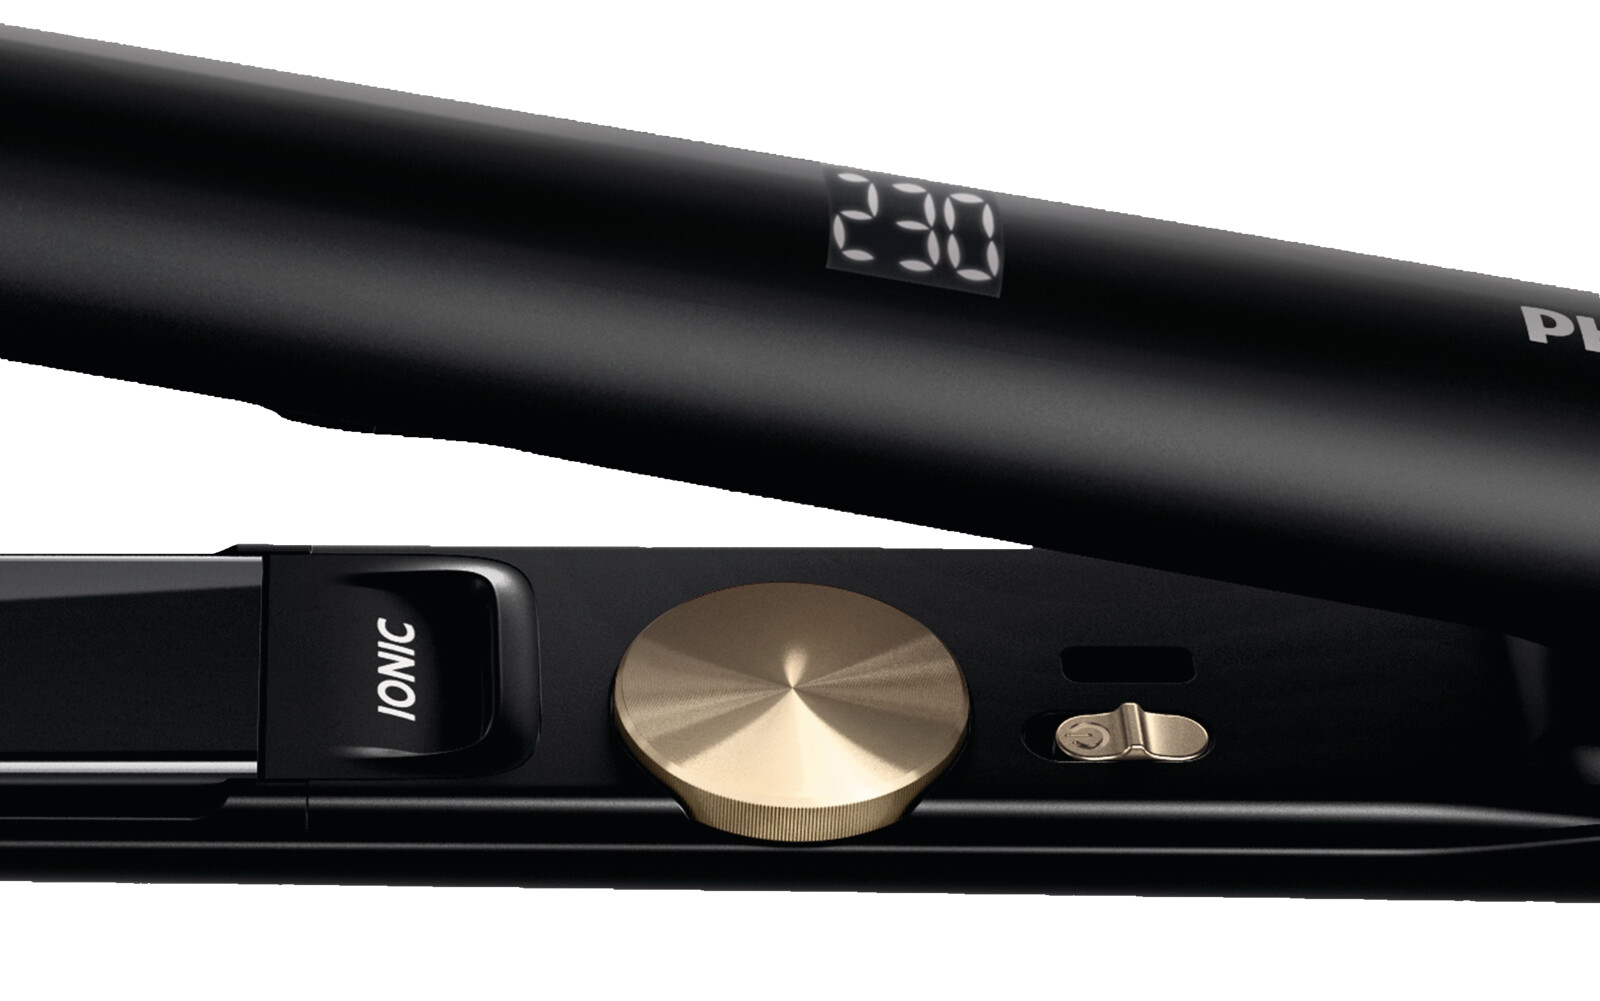 Glätteisen Schwarz PHILIPS HPS 930//00 46 Watt